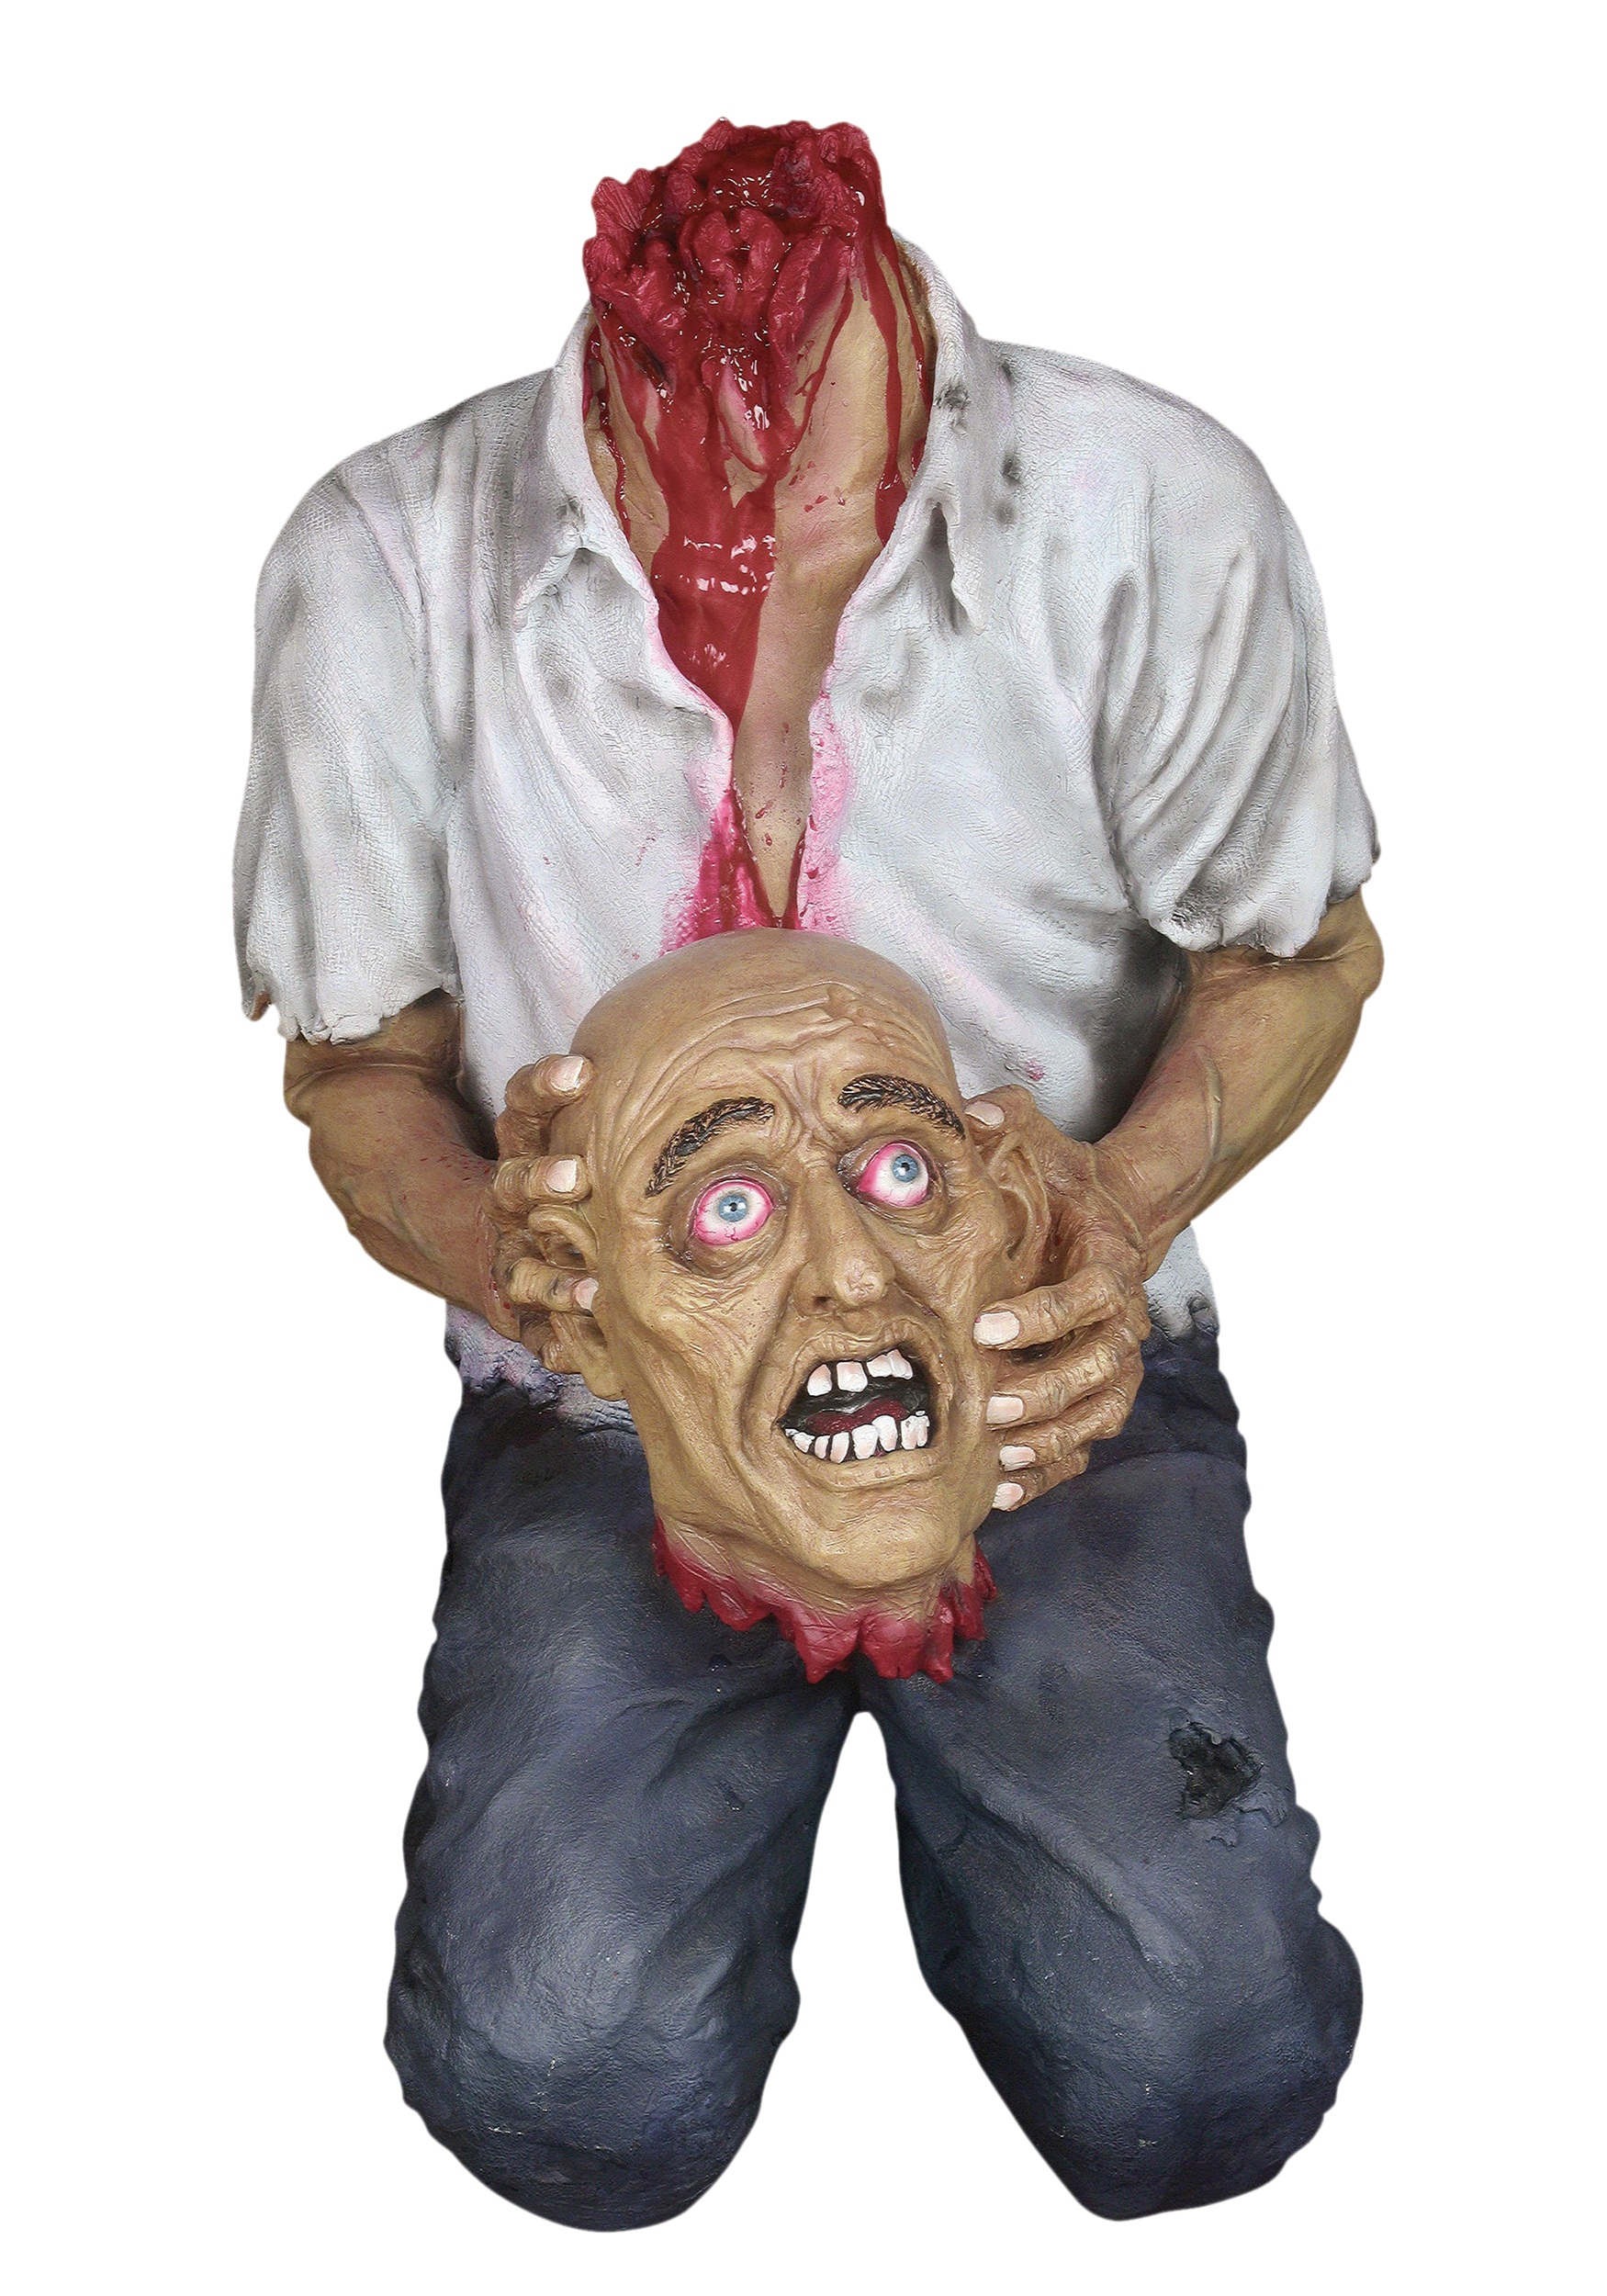 Bleeding Headless Corpse